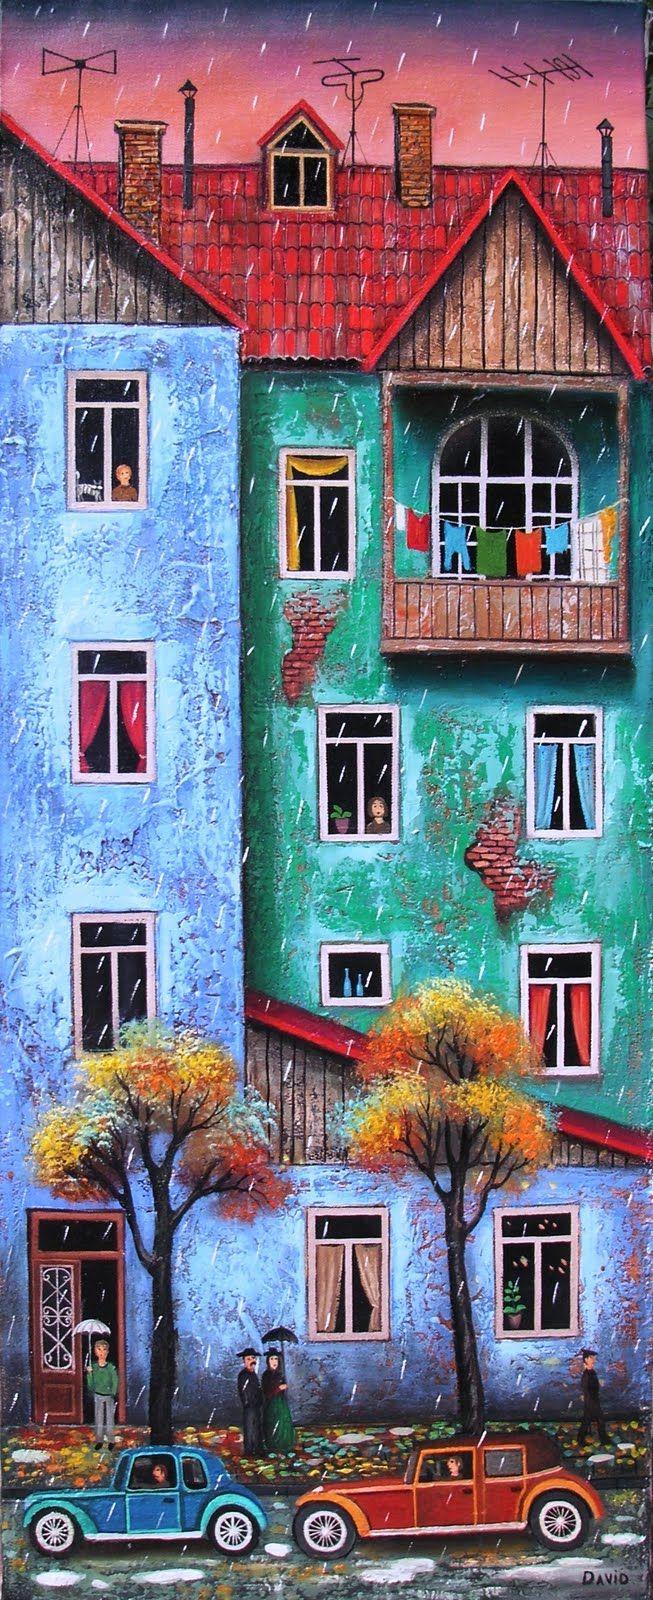 David Martiashvili (b1978 Tbilisi, GEORGIA)